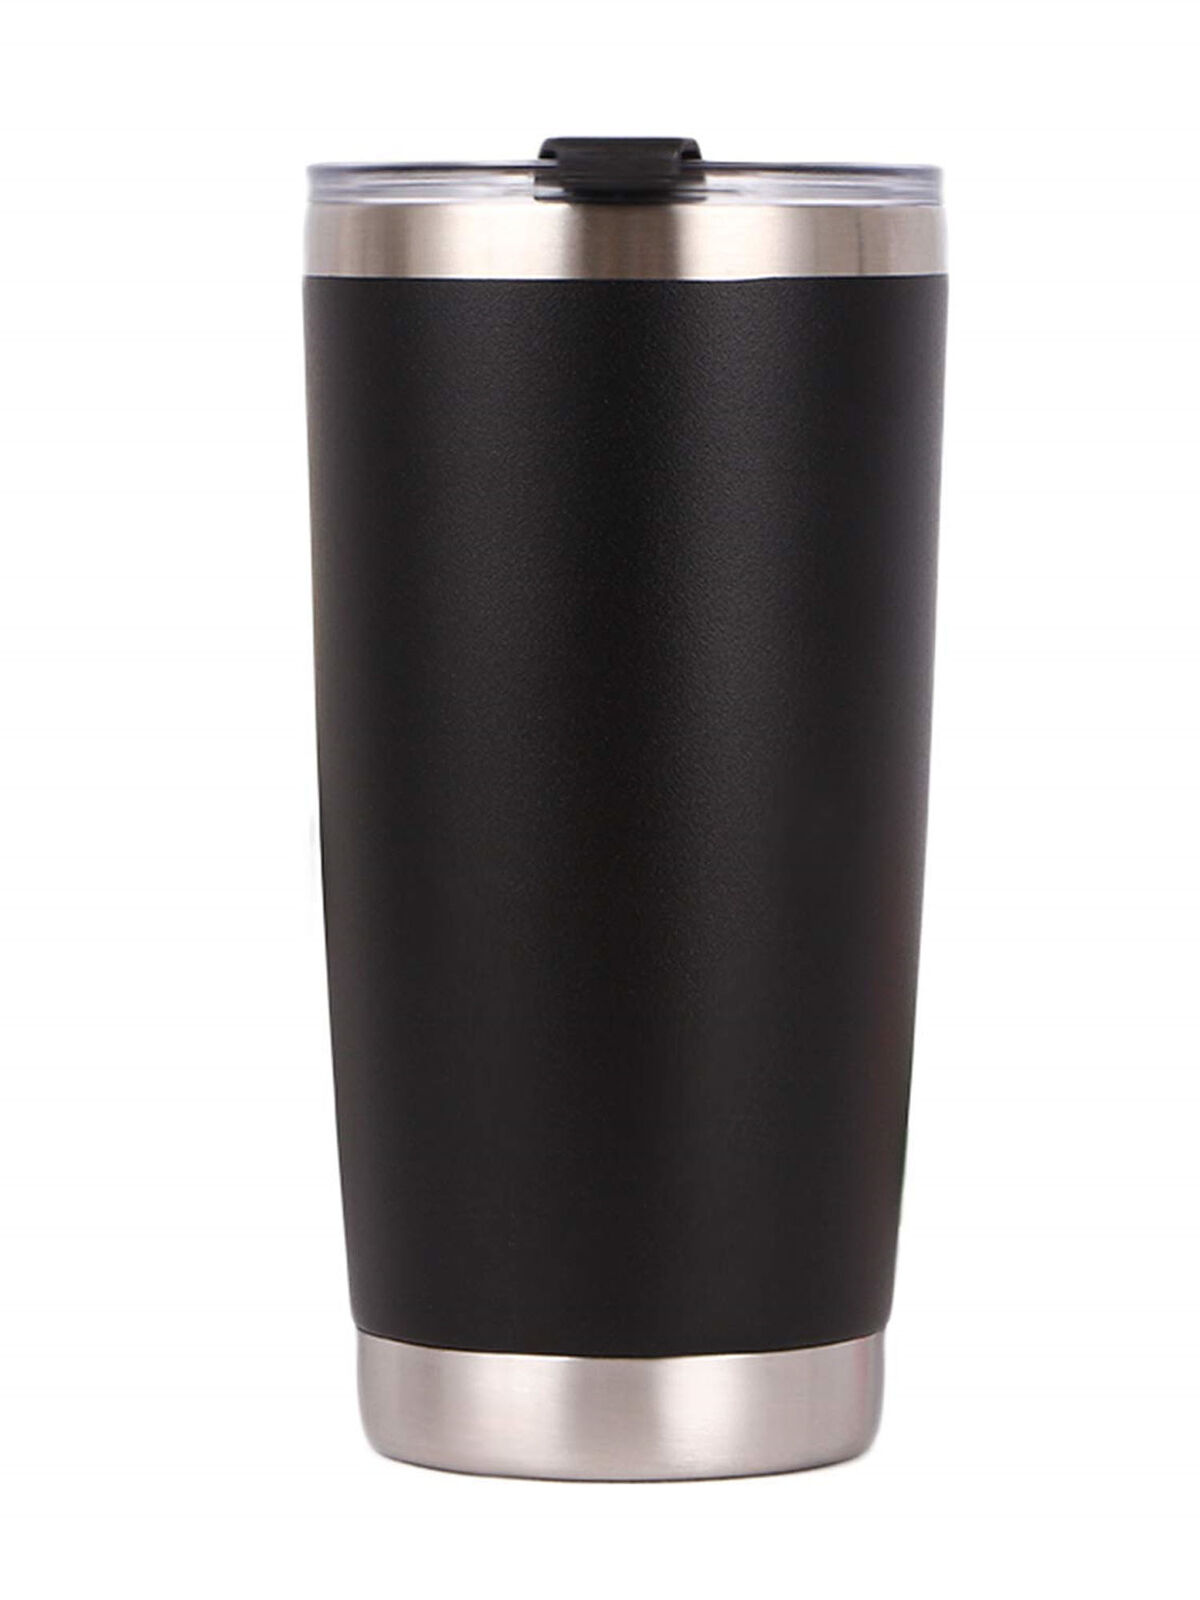 Lookwoild New 20oz Stainless Steel Vacuum Tumbler ...